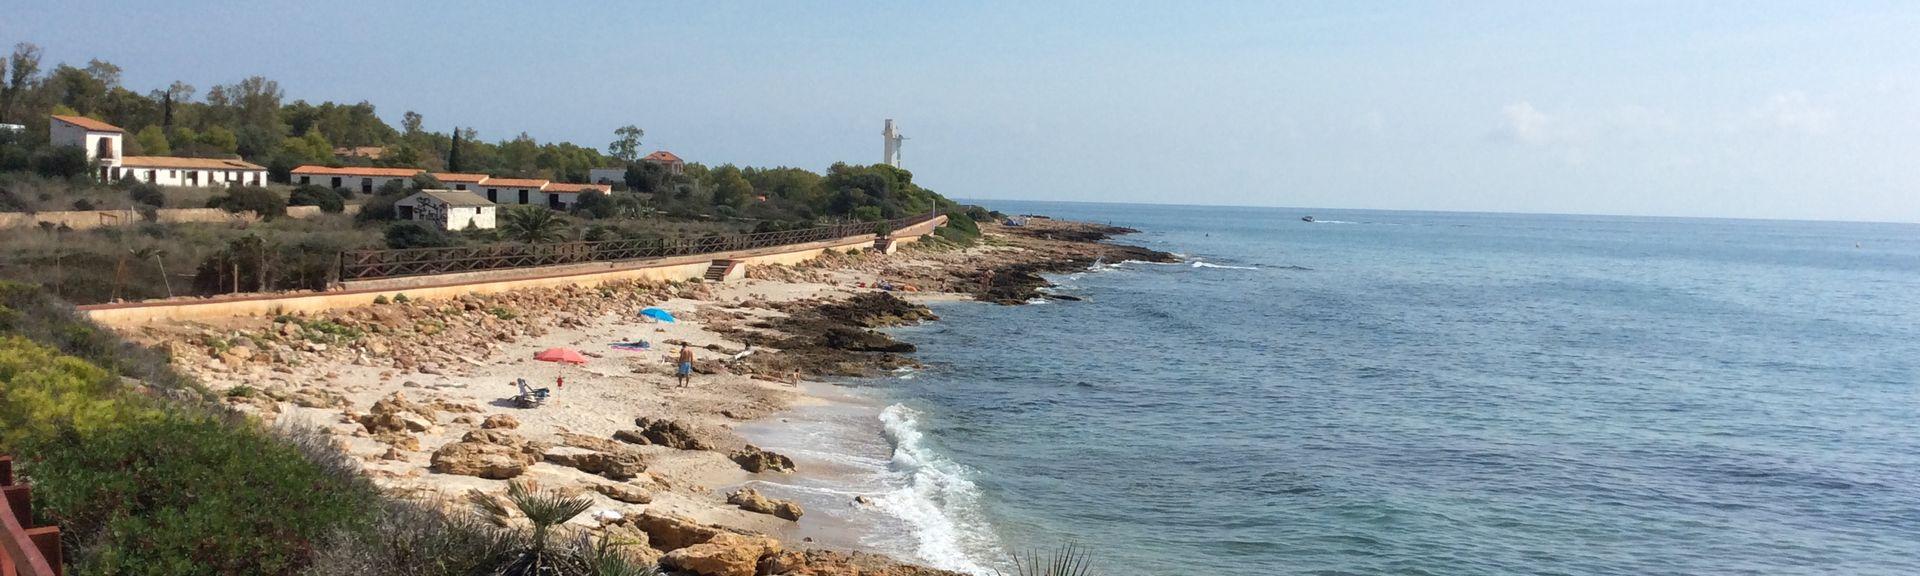 Costa del Azahar, Comunità Valenzana, Spagna